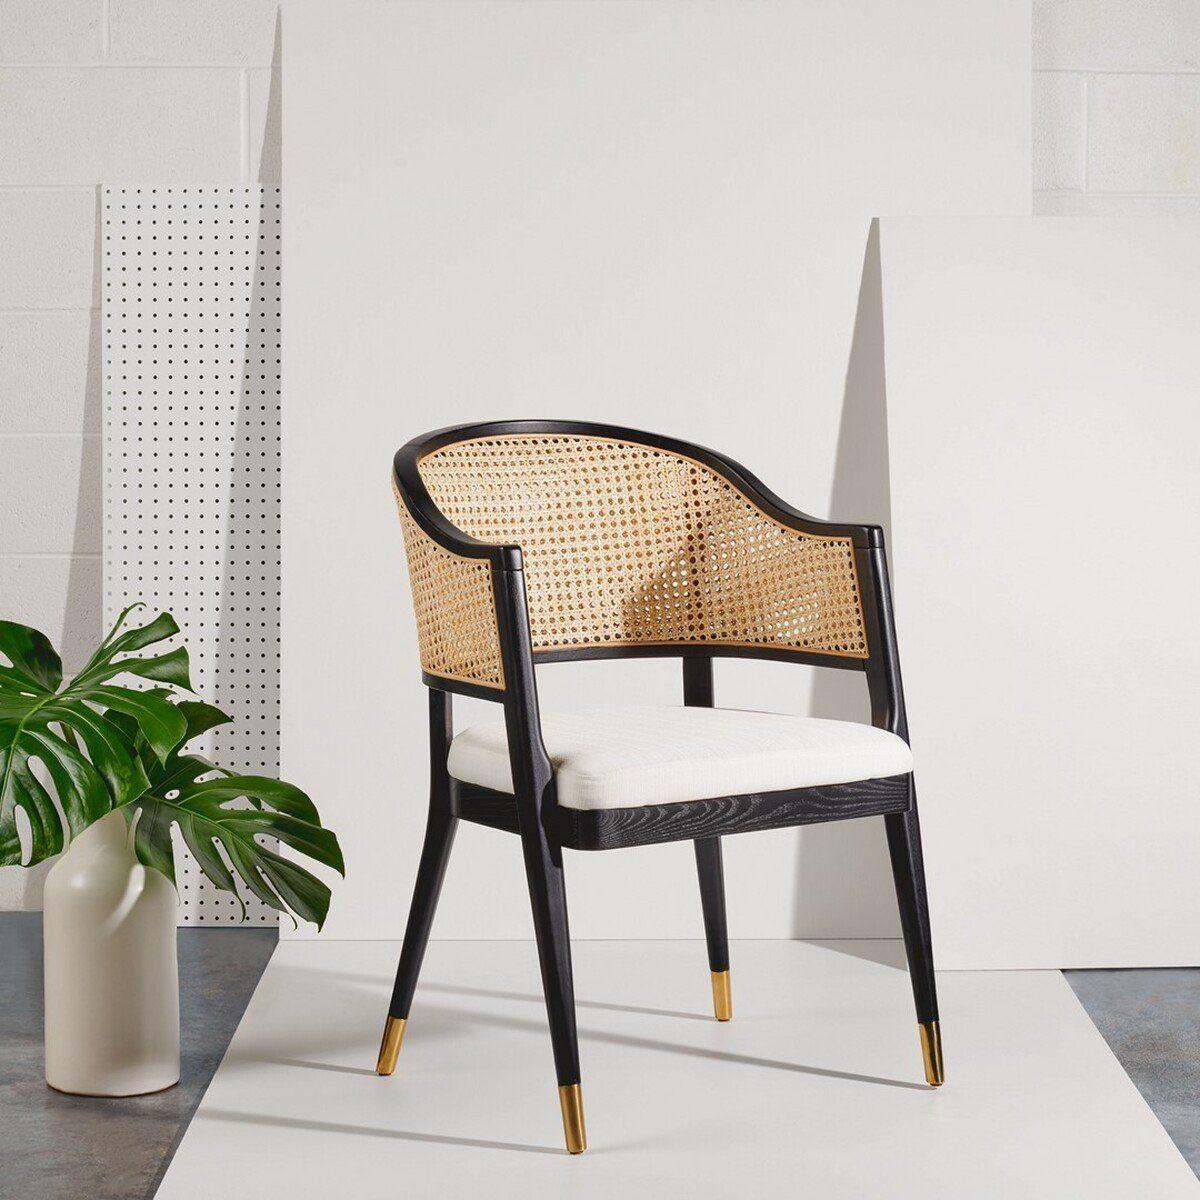 Rogue Rattan Dining Chair - Black